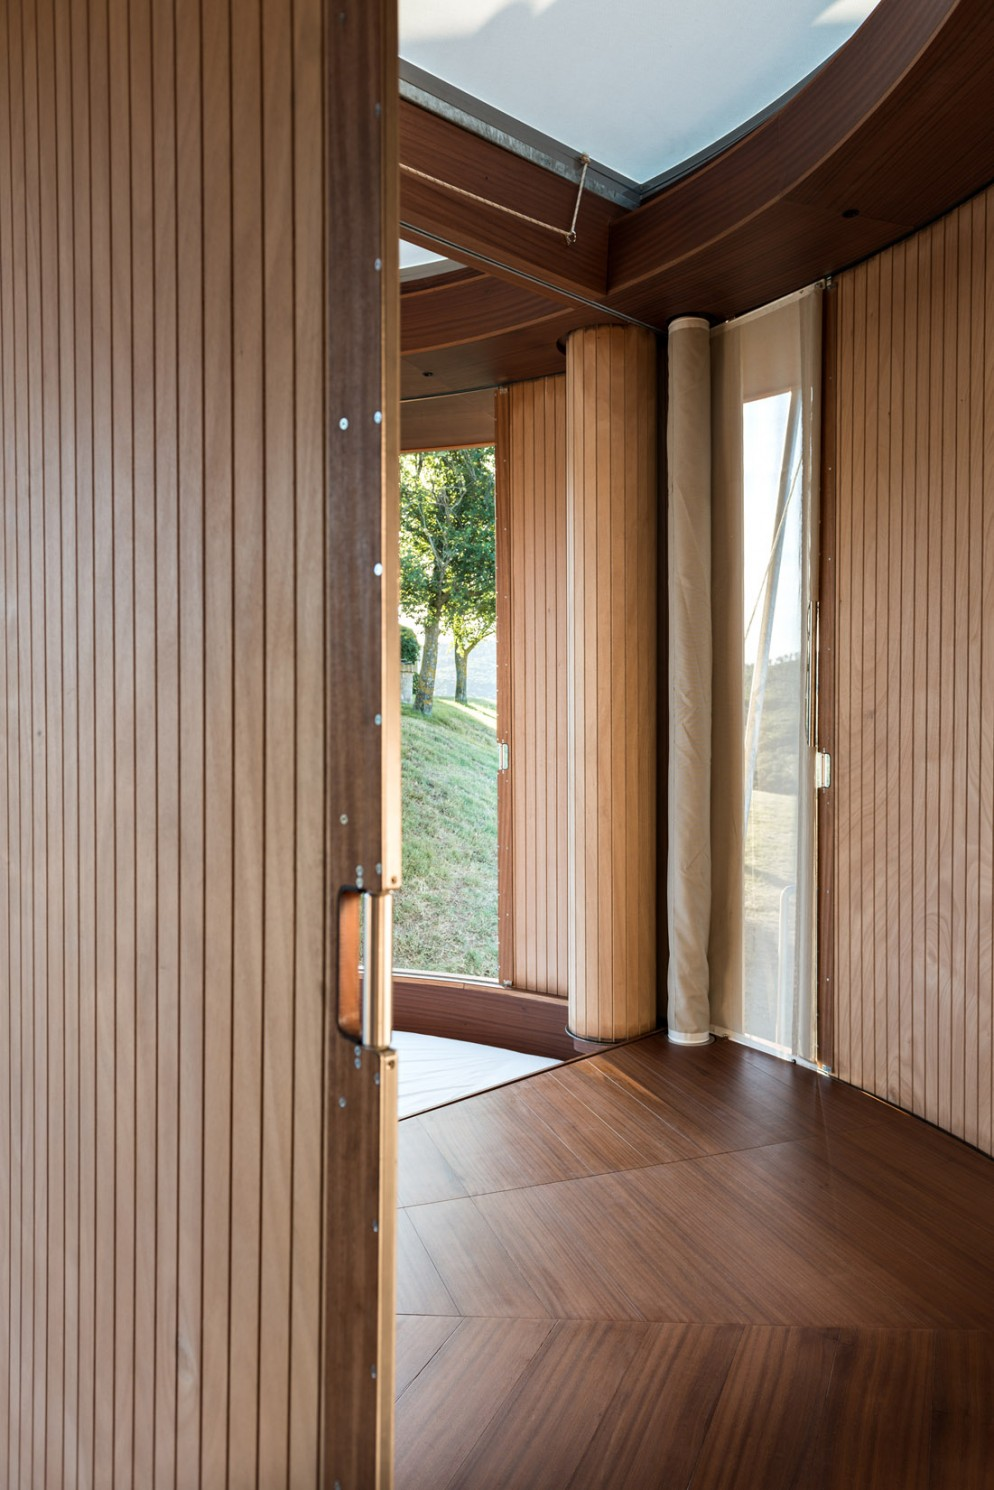 casa-ojalá-suite-nomade-architetto-beatrice-bonzanigo-10